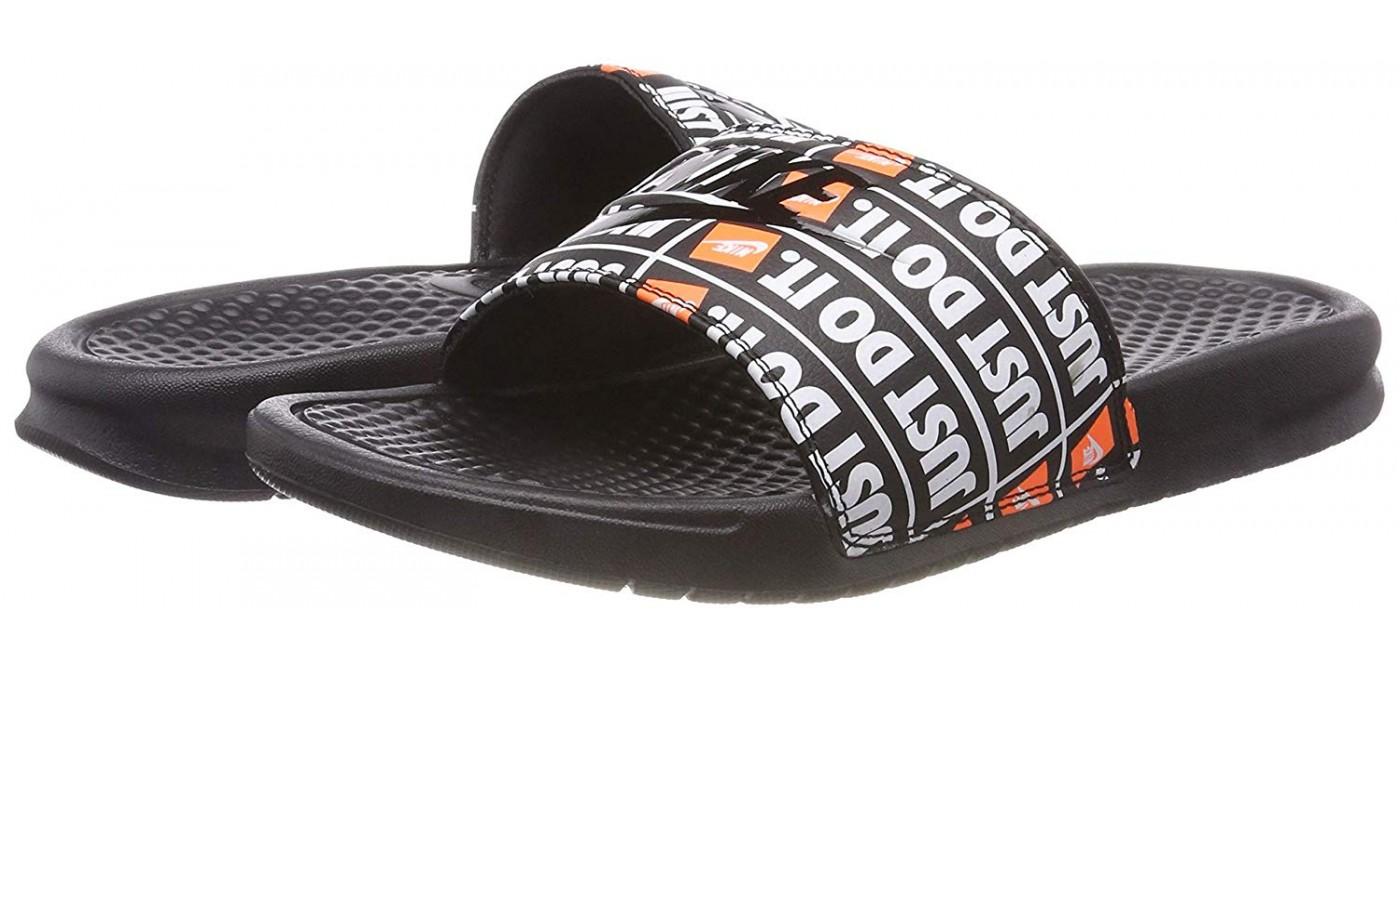 official photos d8ea9 72513 ... Nike Benassi JDI Slide Pair ...